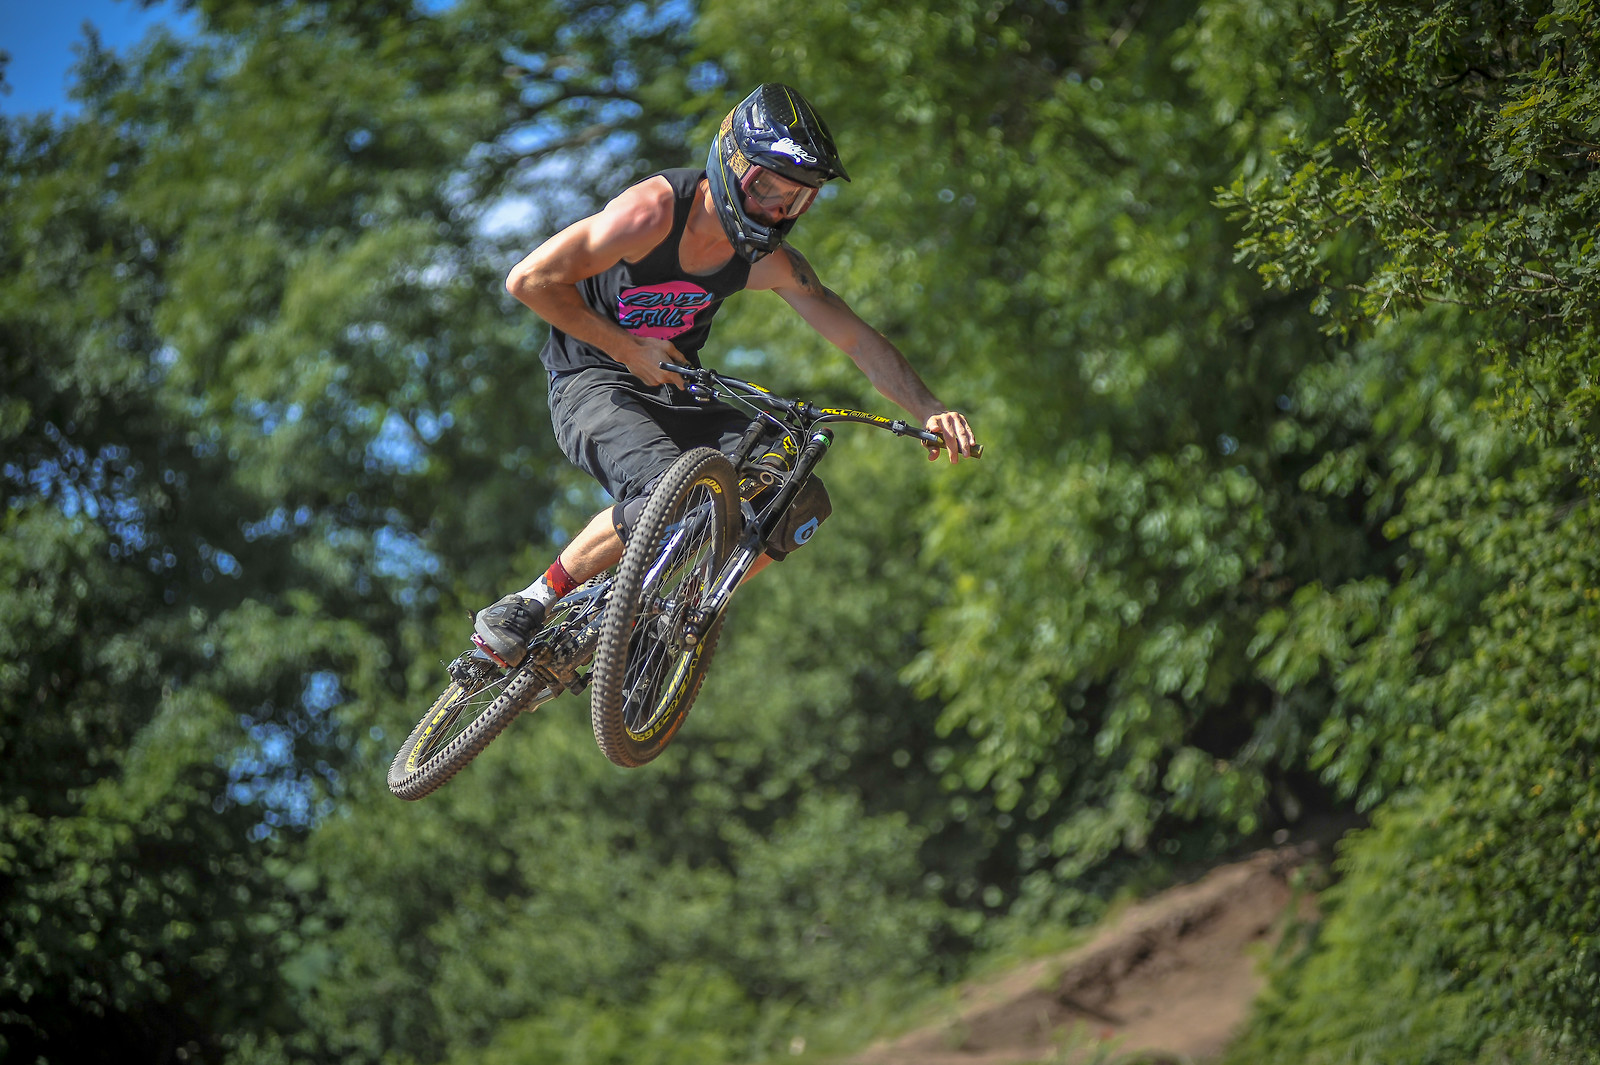 DSC5326 - robbarkerimages2017 - Mountain Biking Pictures - Vital MTB